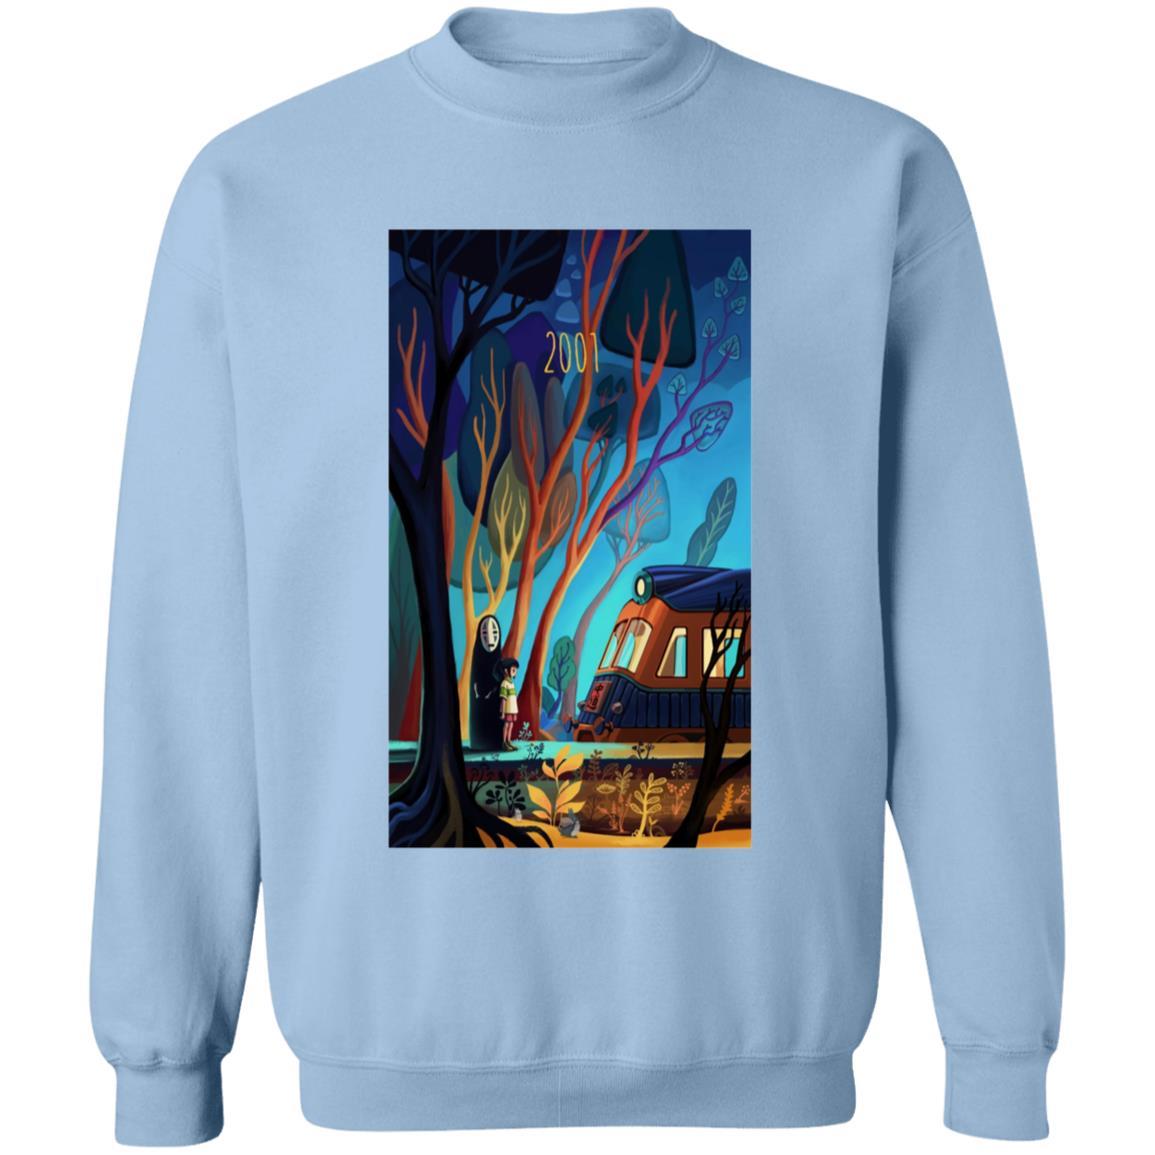 Spirited Away 2001 Illustration Sweatshirt